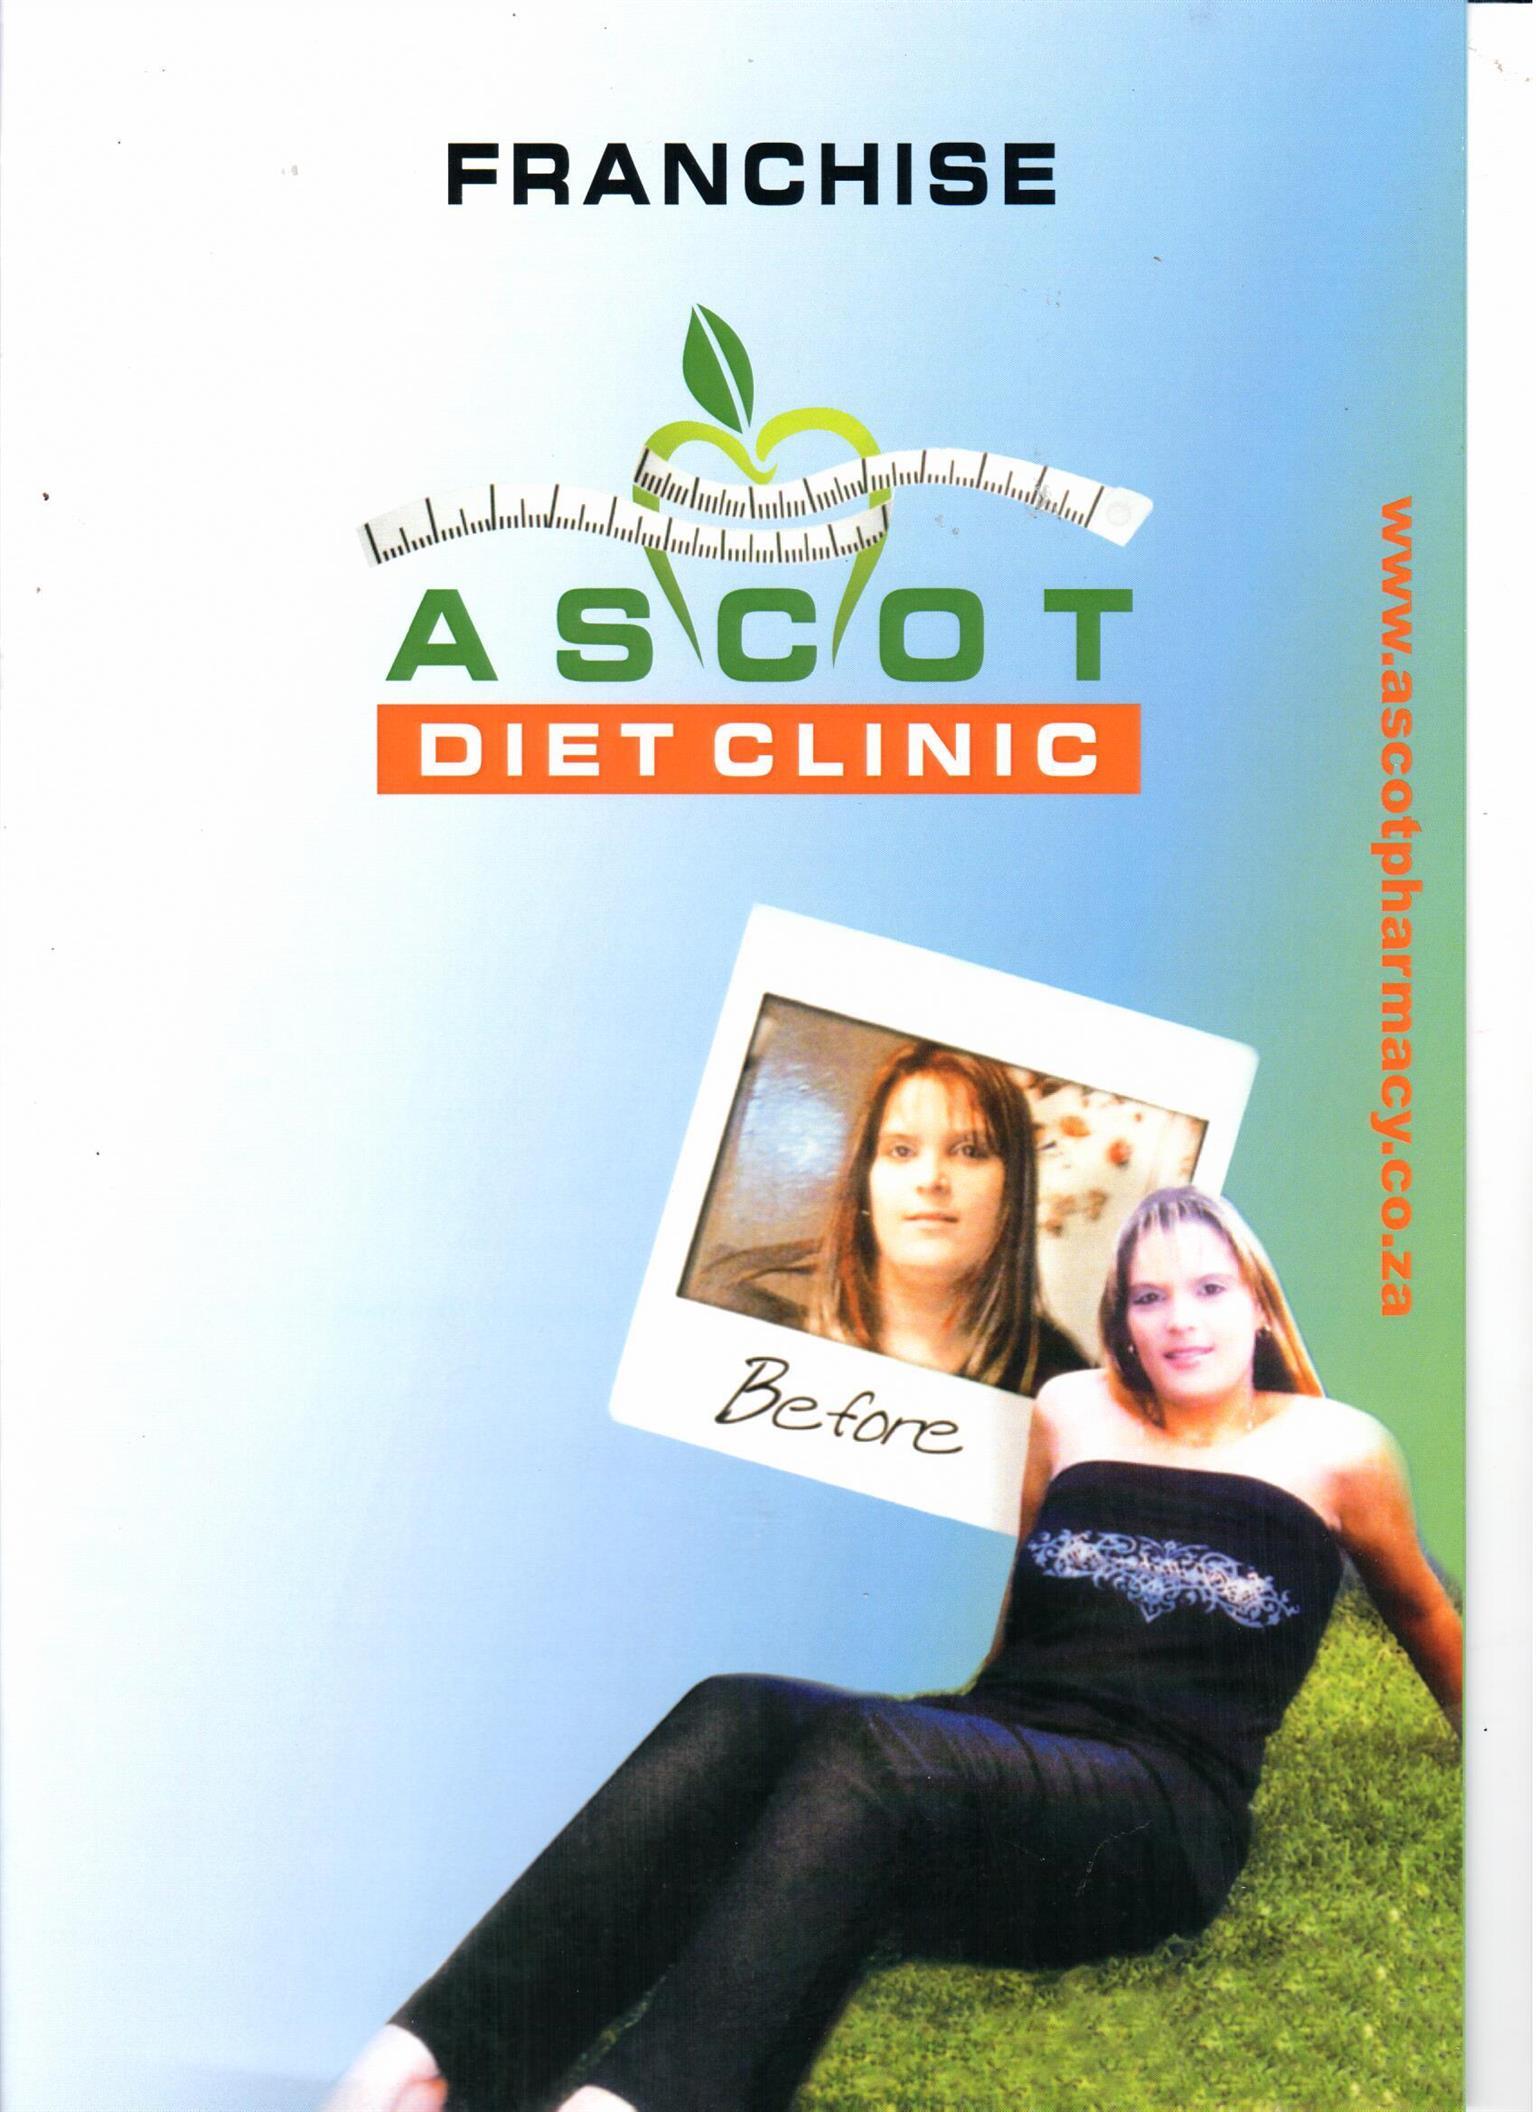 Ascot Diet Clinic Franchise for sale